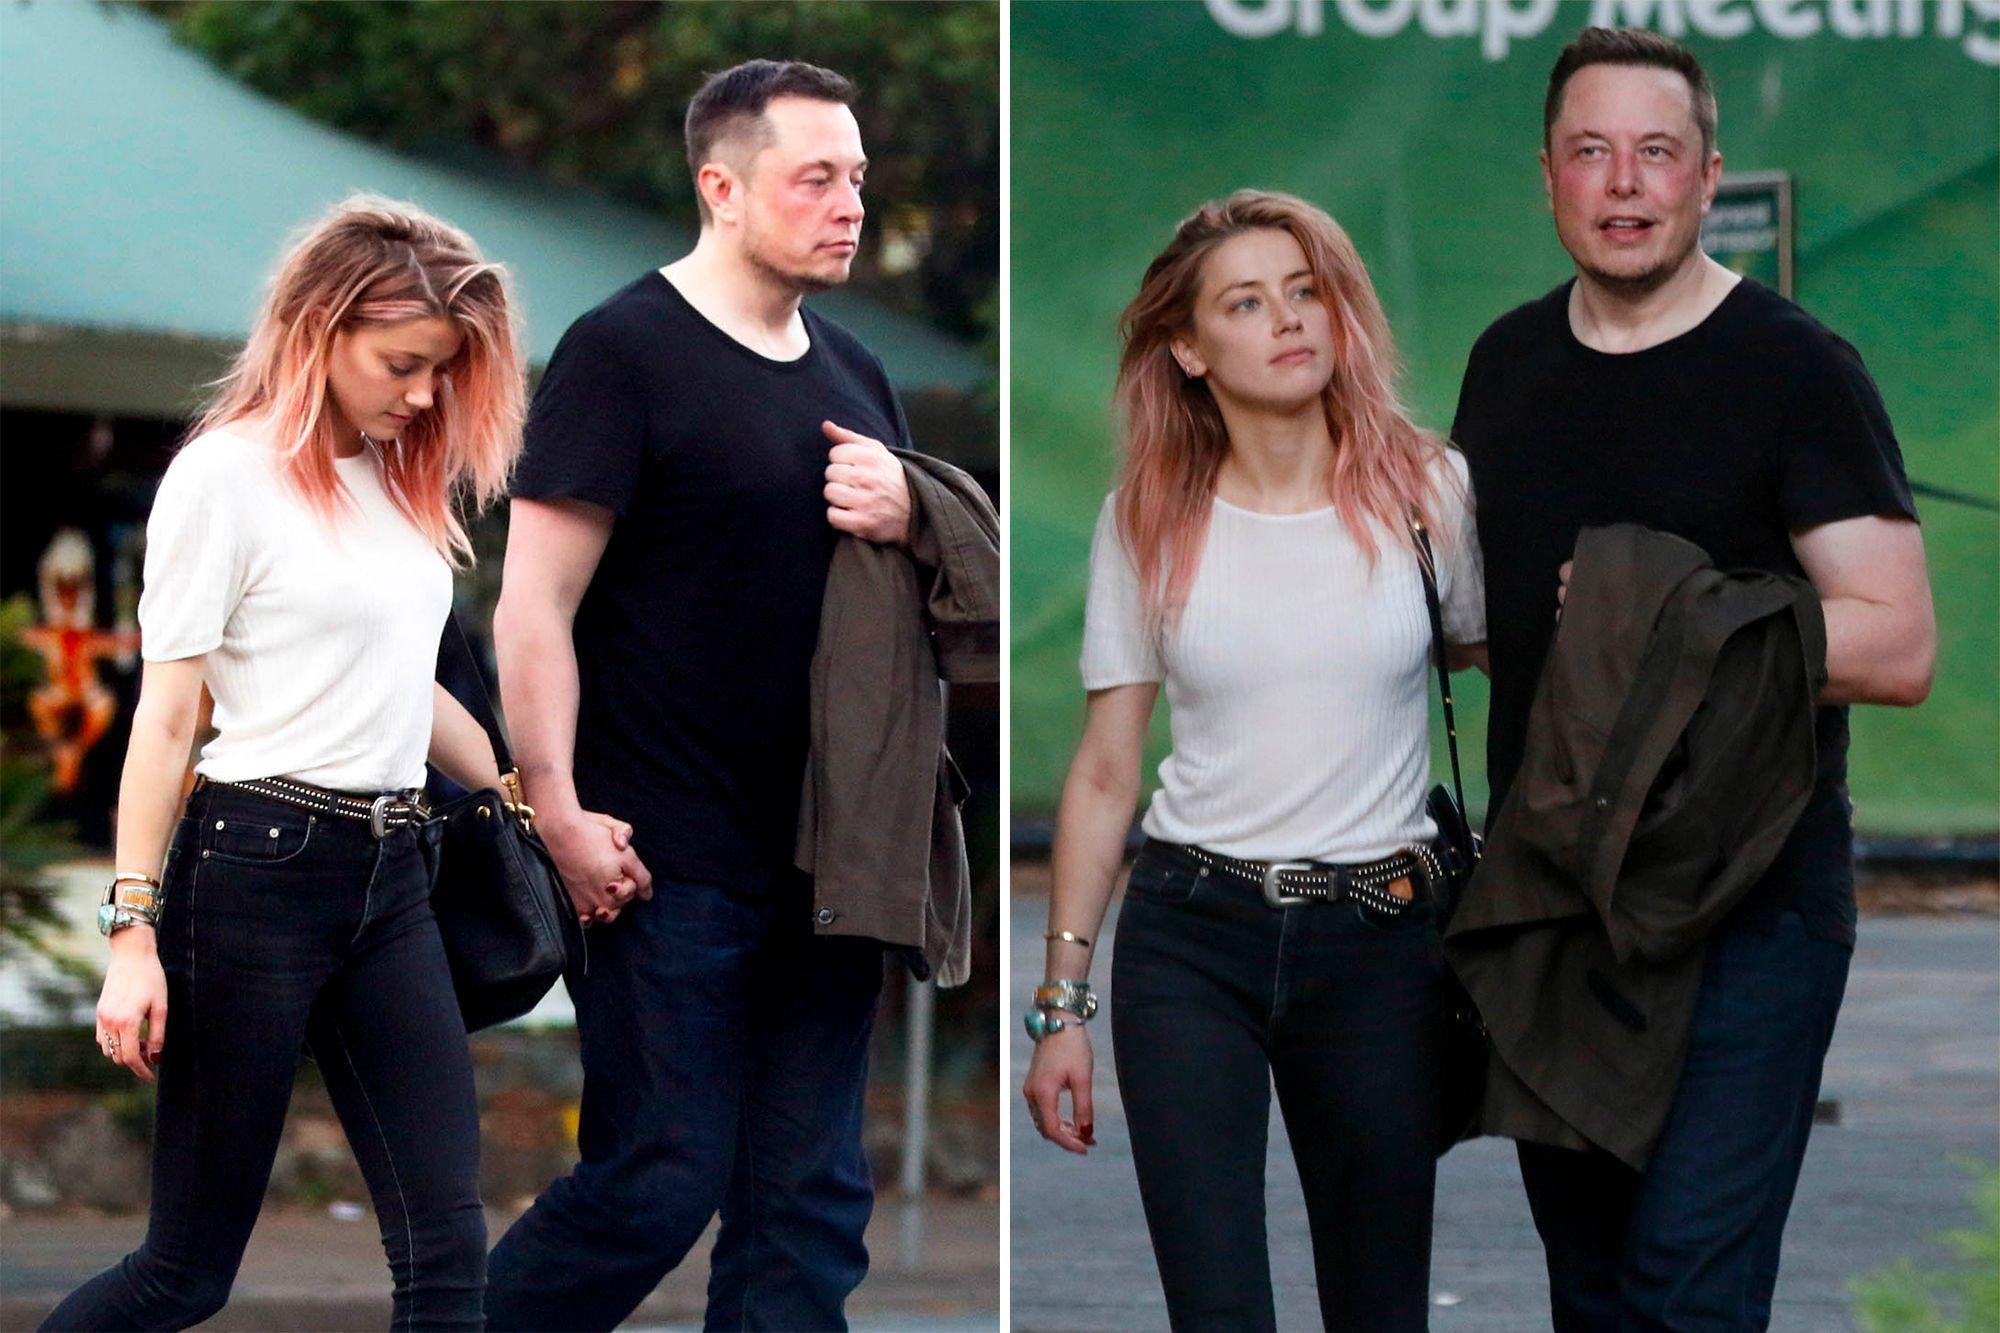 Nguoi tinh cua ty phu Elon Musk anh 3